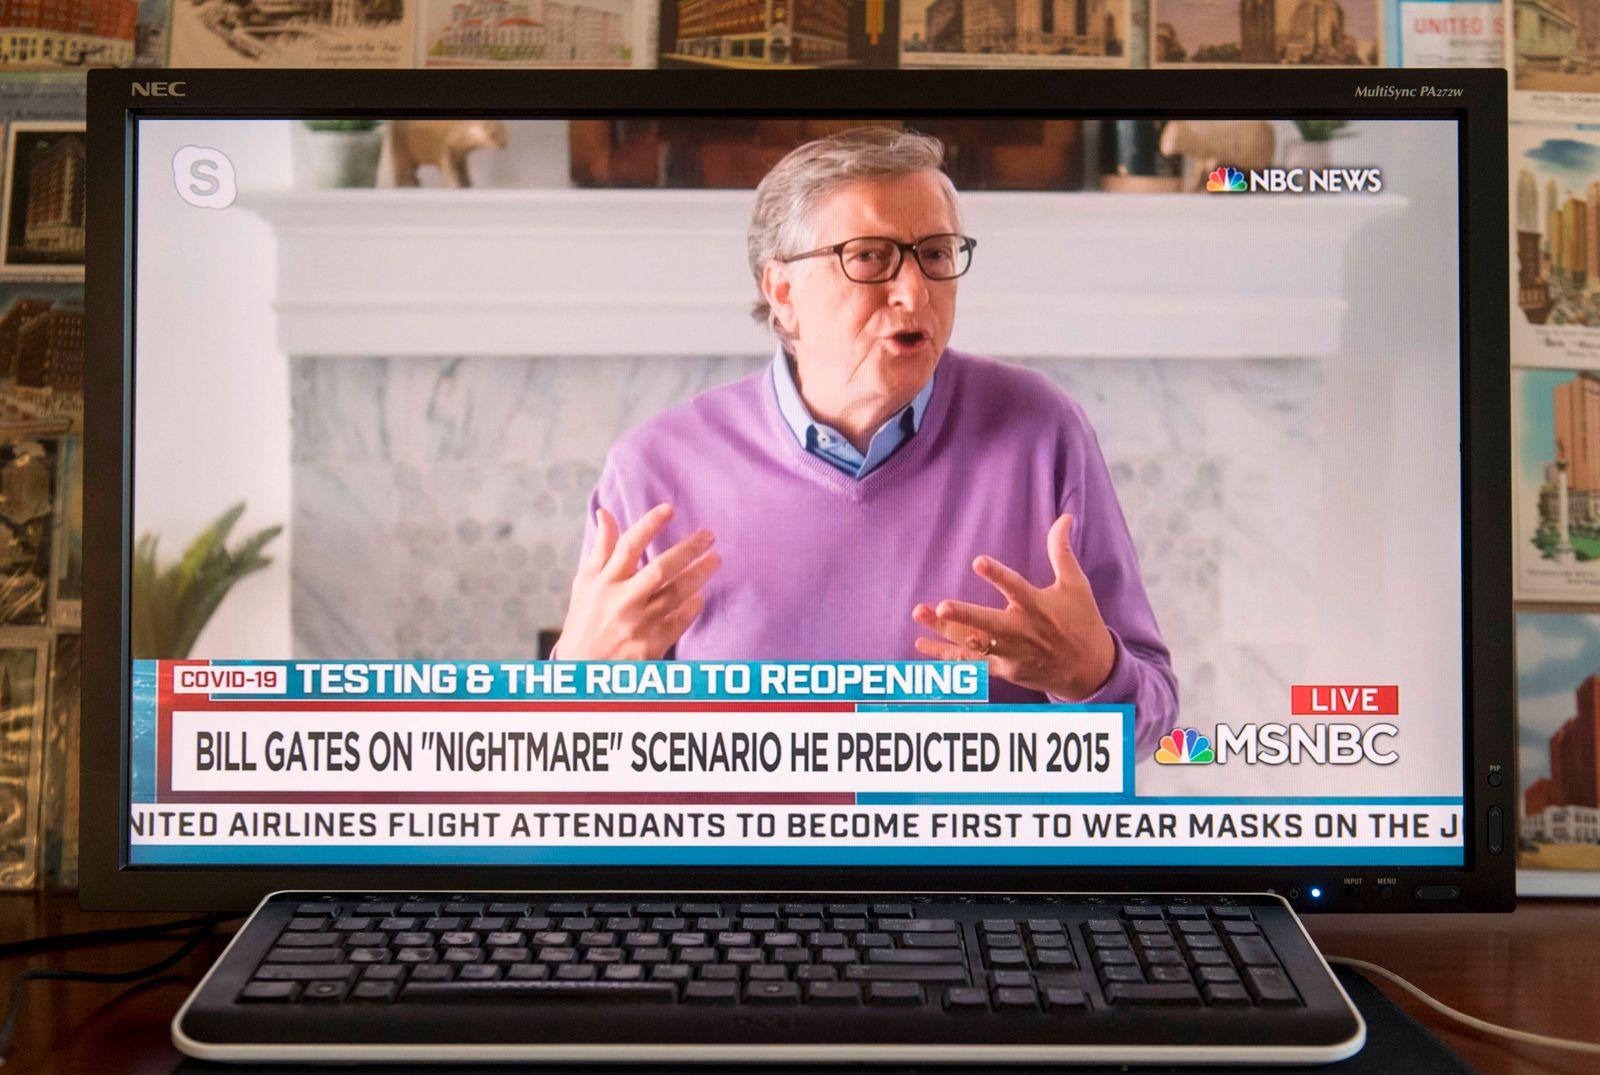 Coronavirus in den USA, Bill Gates im TV Interview April 23, 2020 - New York, New York - U.S. - A screen grab of a NBC s